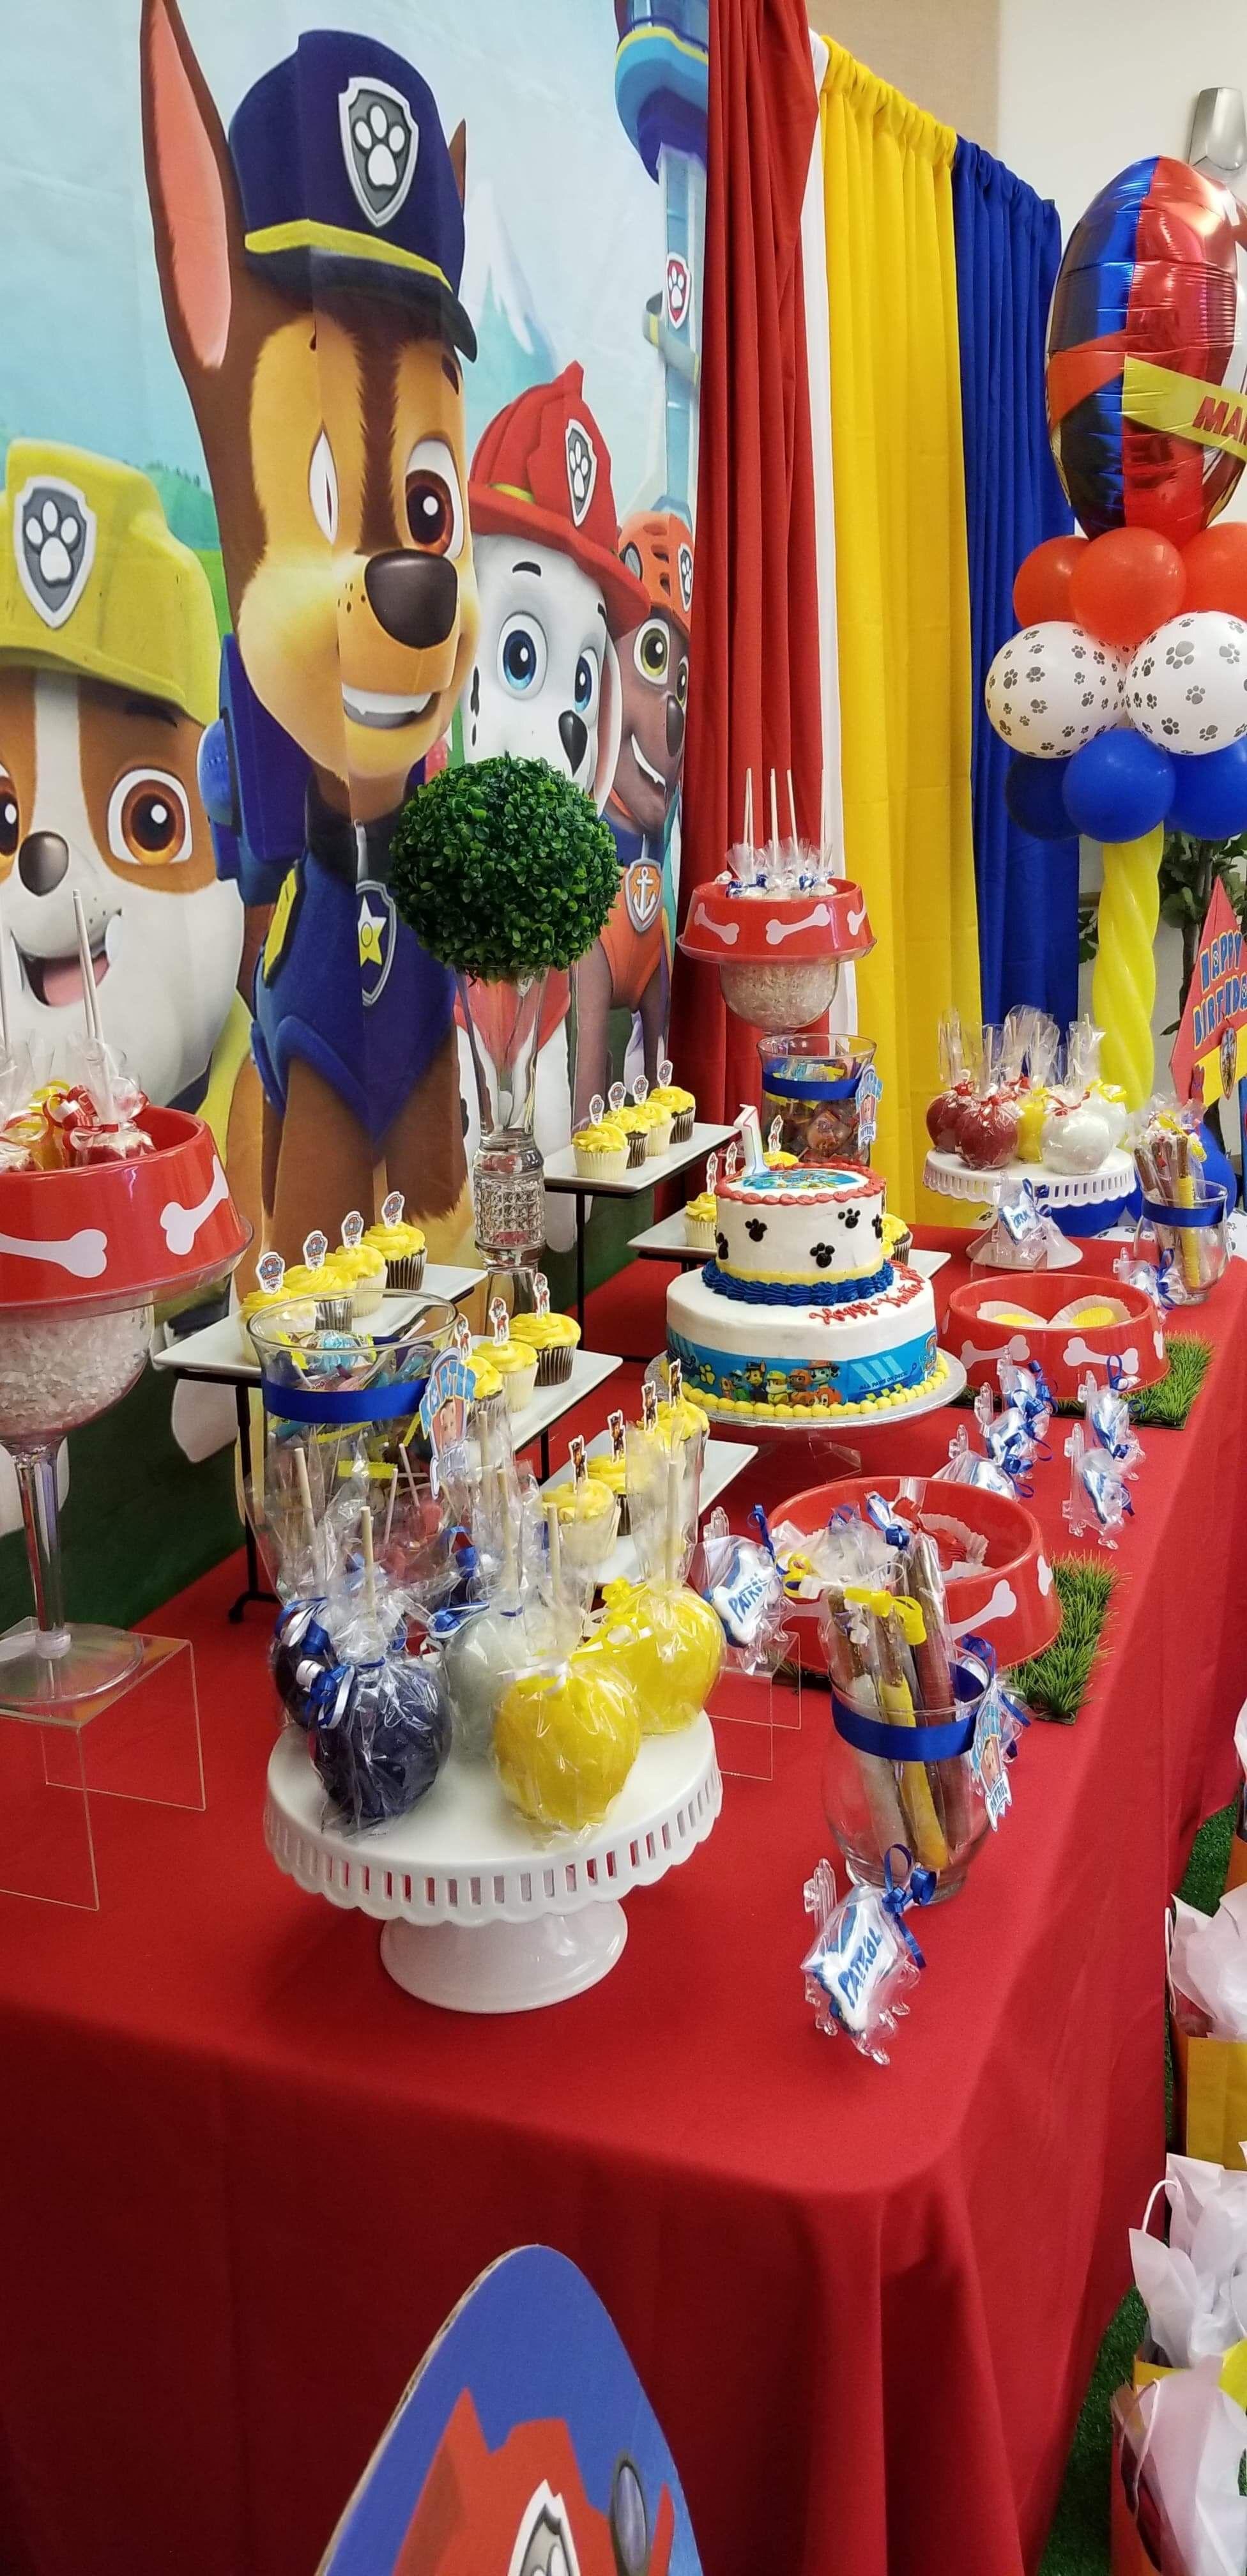 Paw Patrol 1st Birthday Dessert Table Paw Patrol Party Decorations Paw Patrol Birthday Cake Paw Patrol Birthday Theme